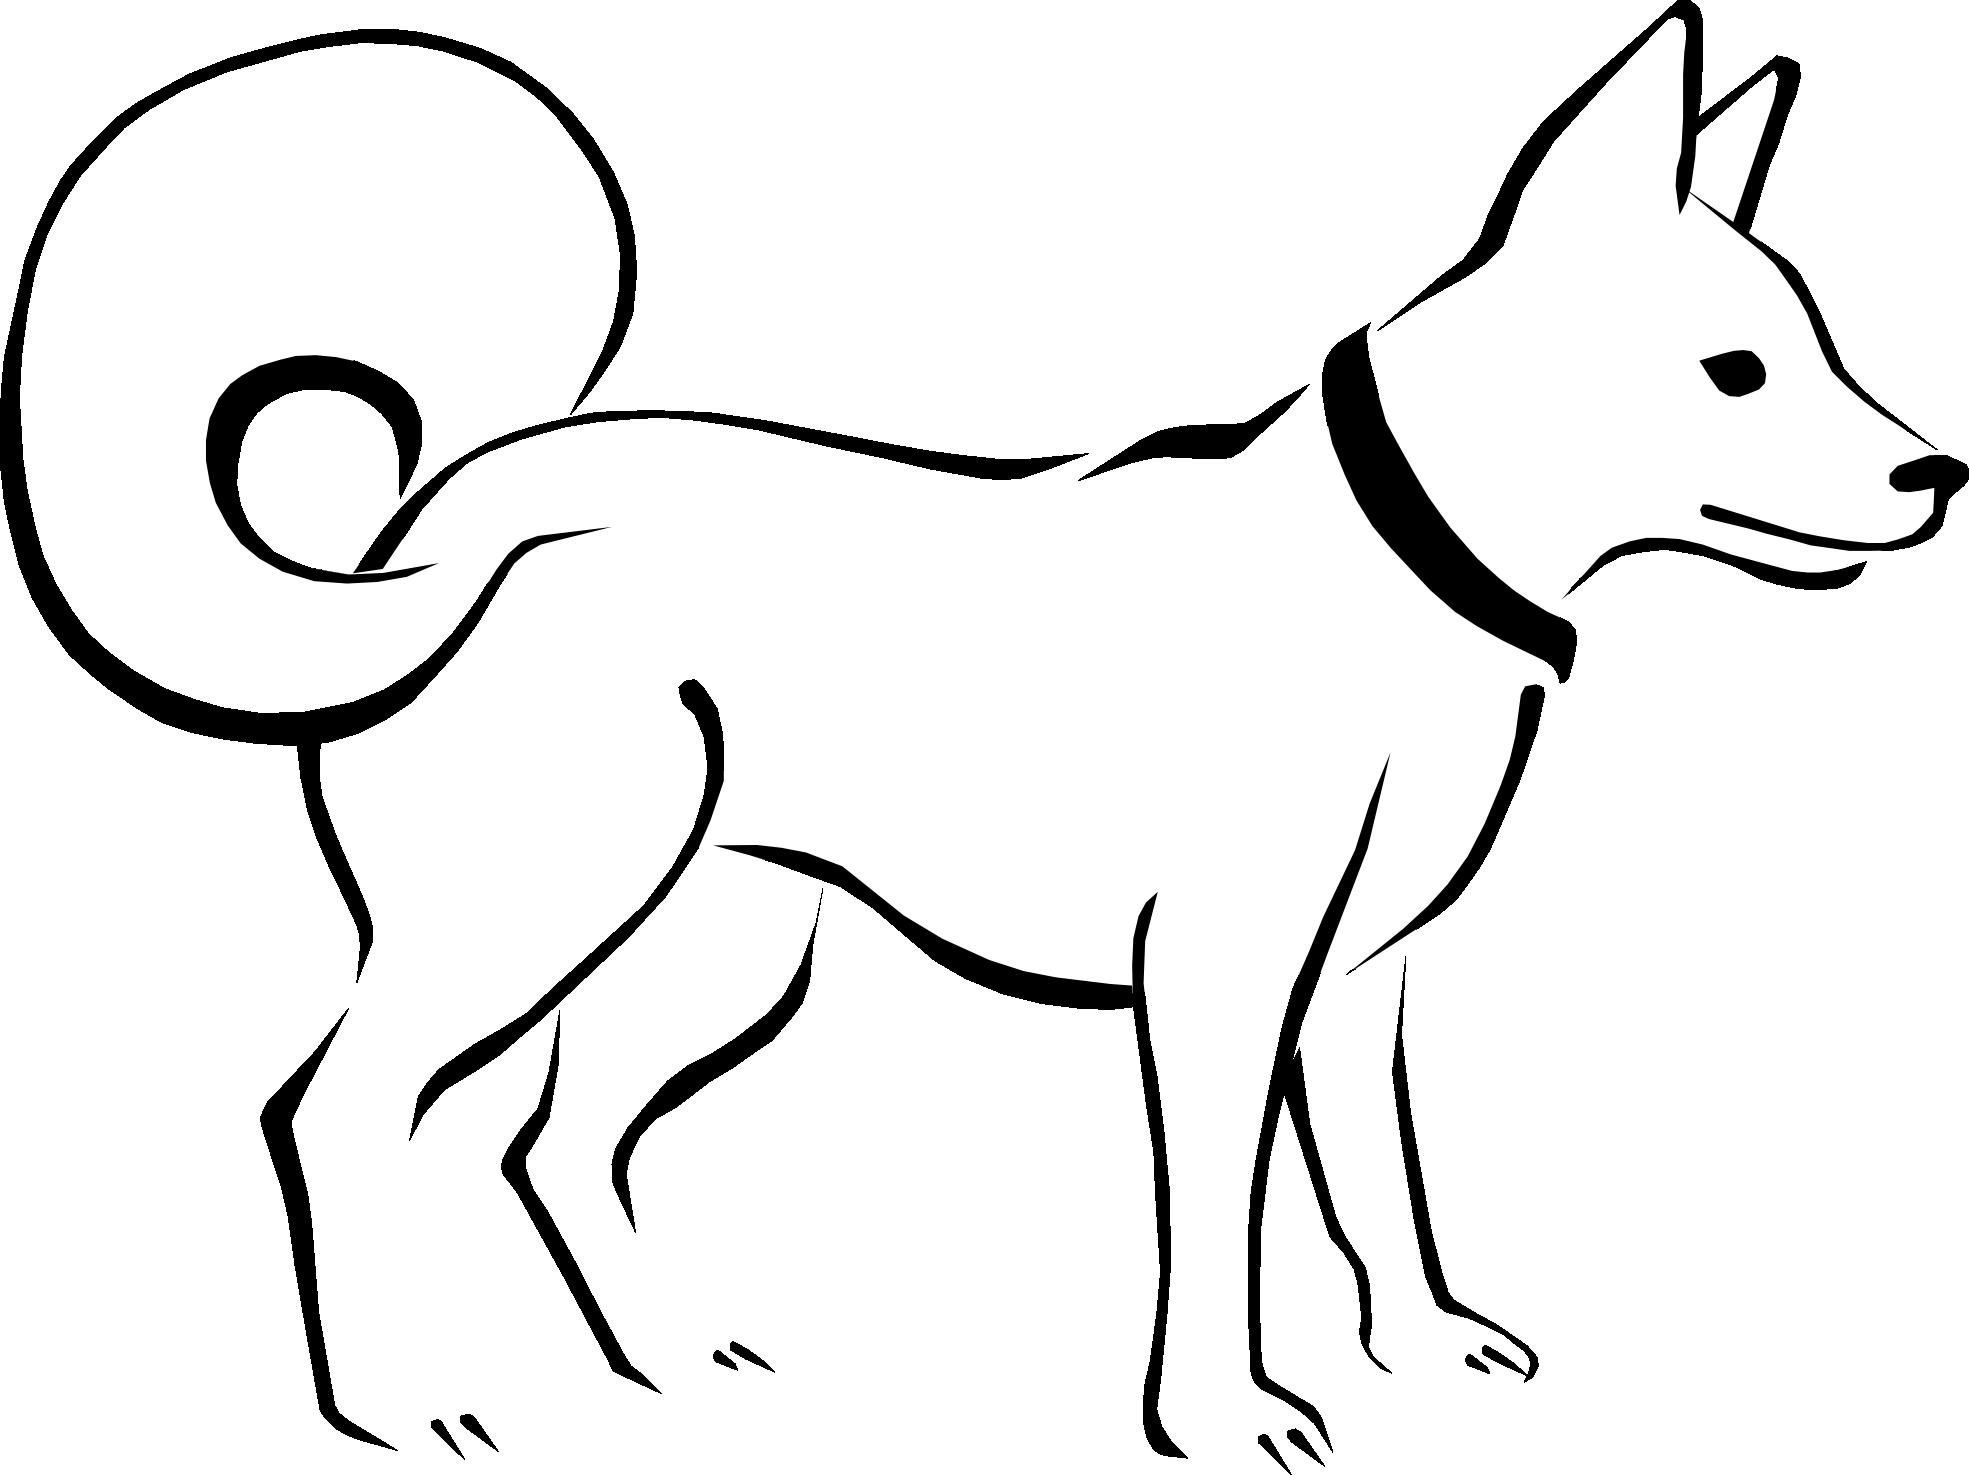 Cute puppy dog clipart black and white jpg freeuse stock Cute Puppies PNG Black And White Transparent Cute Puppies Black And ... jpg freeuse stock